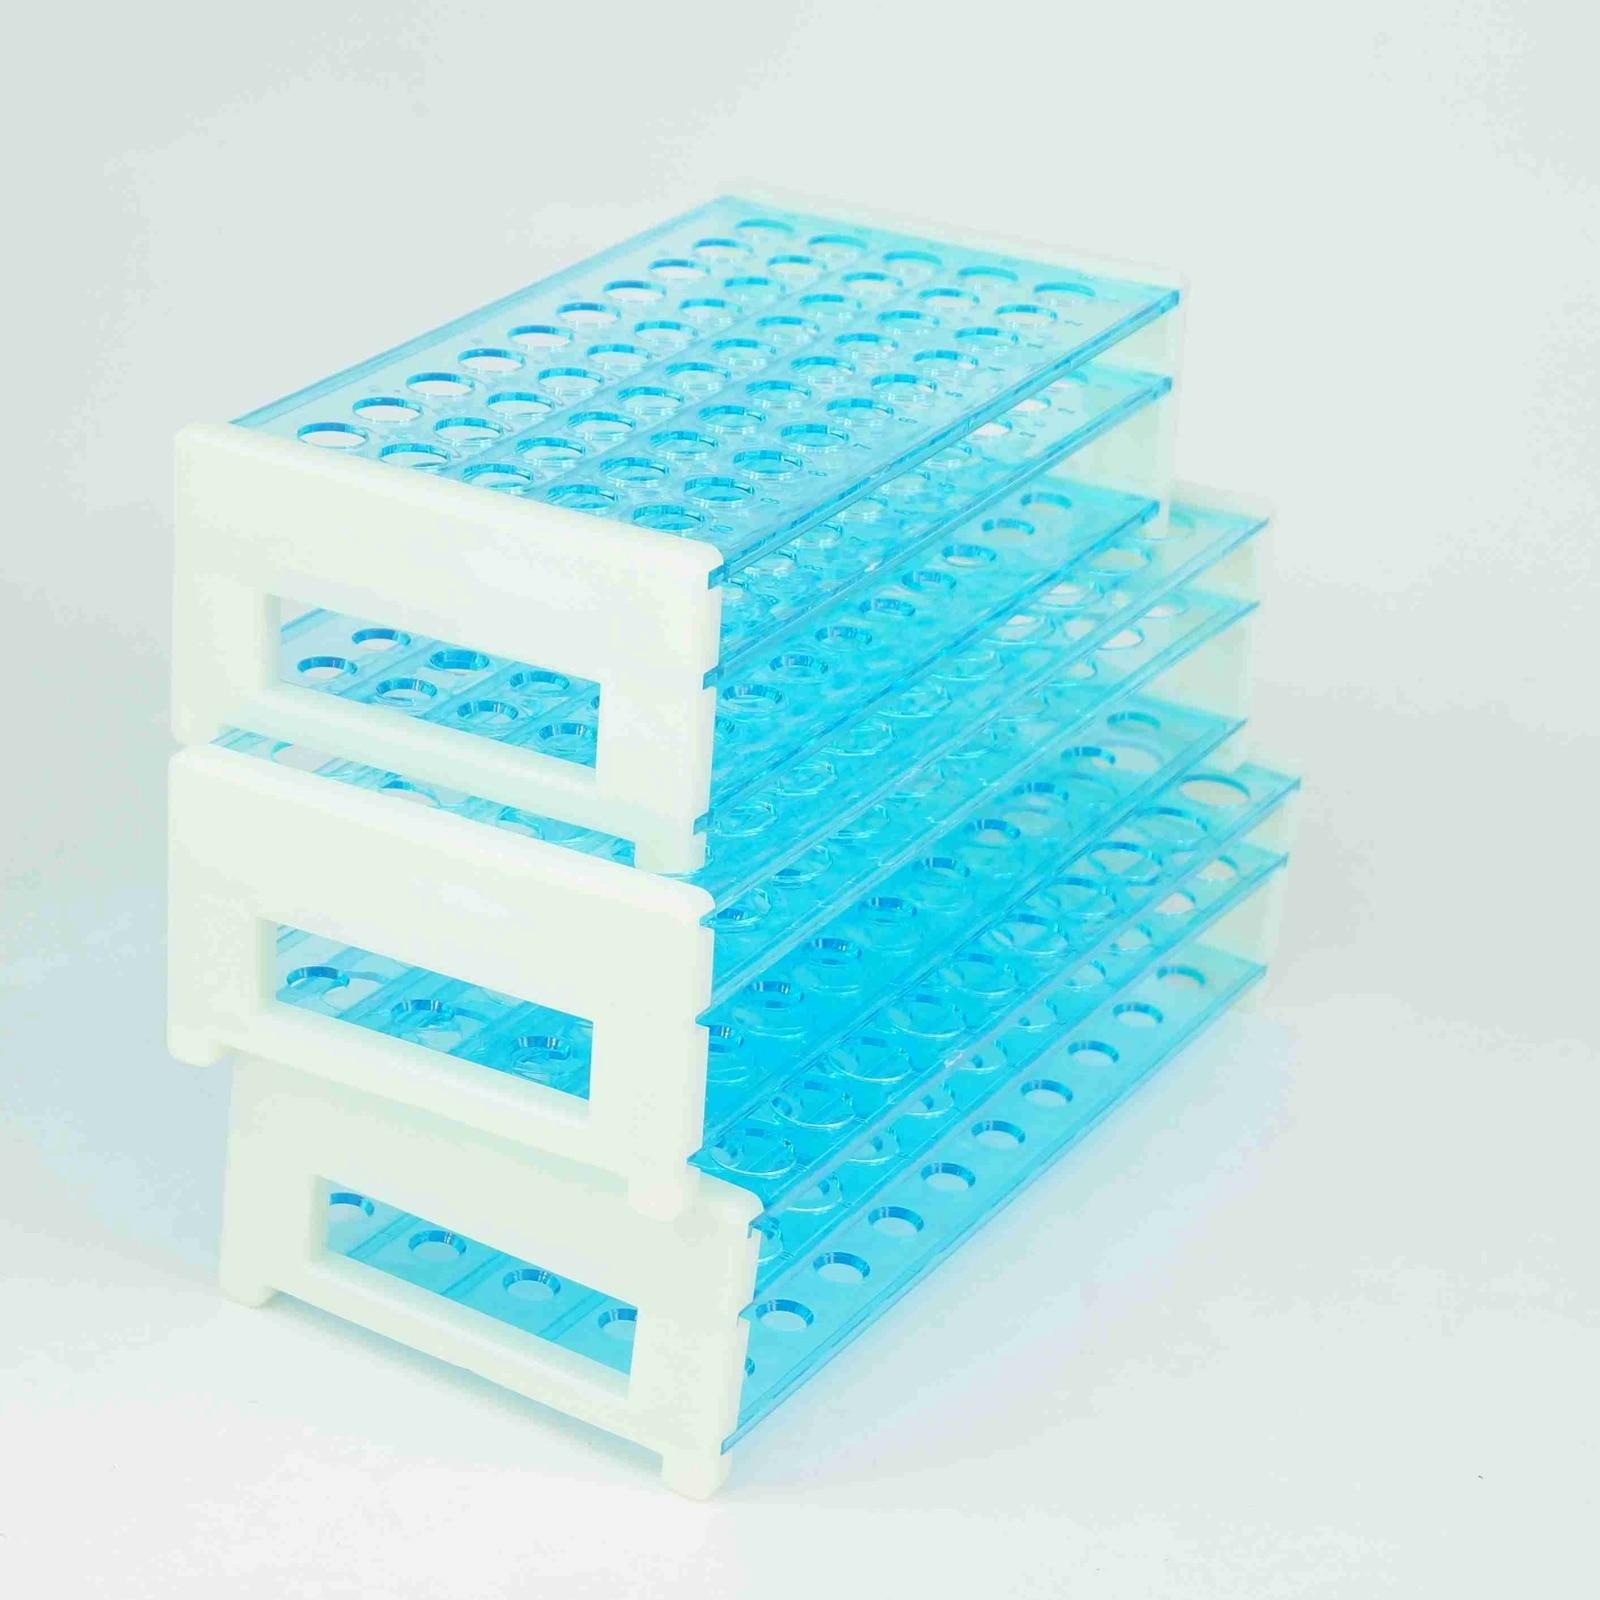 13/16/18mm Diameter 50/50/40 Holes Plastic Double Deck Test Tube Stand Rack